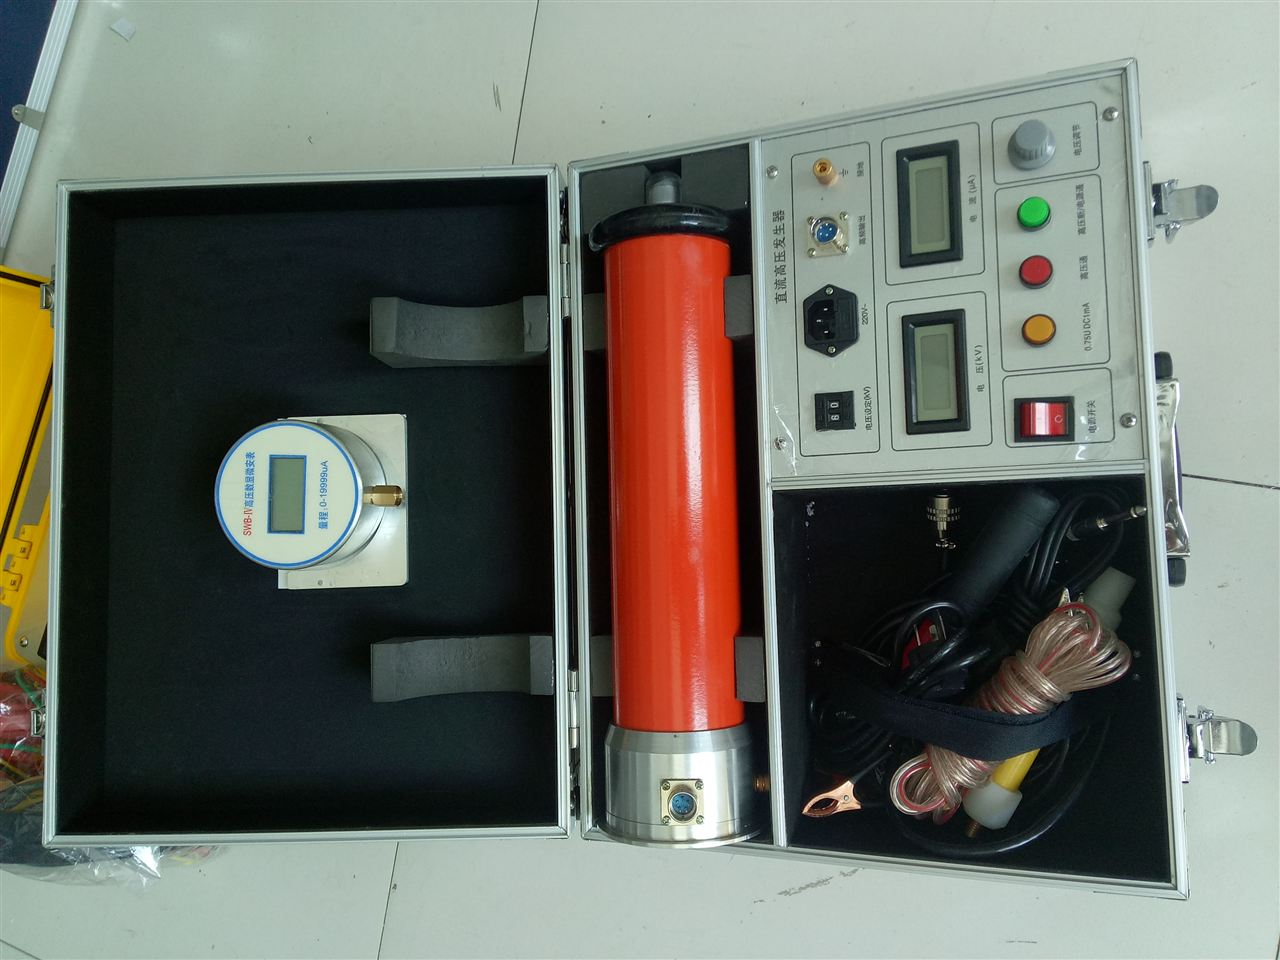 gs系列直流高压发生器采用30—50khz高频倍压电路,率先应用最新pum